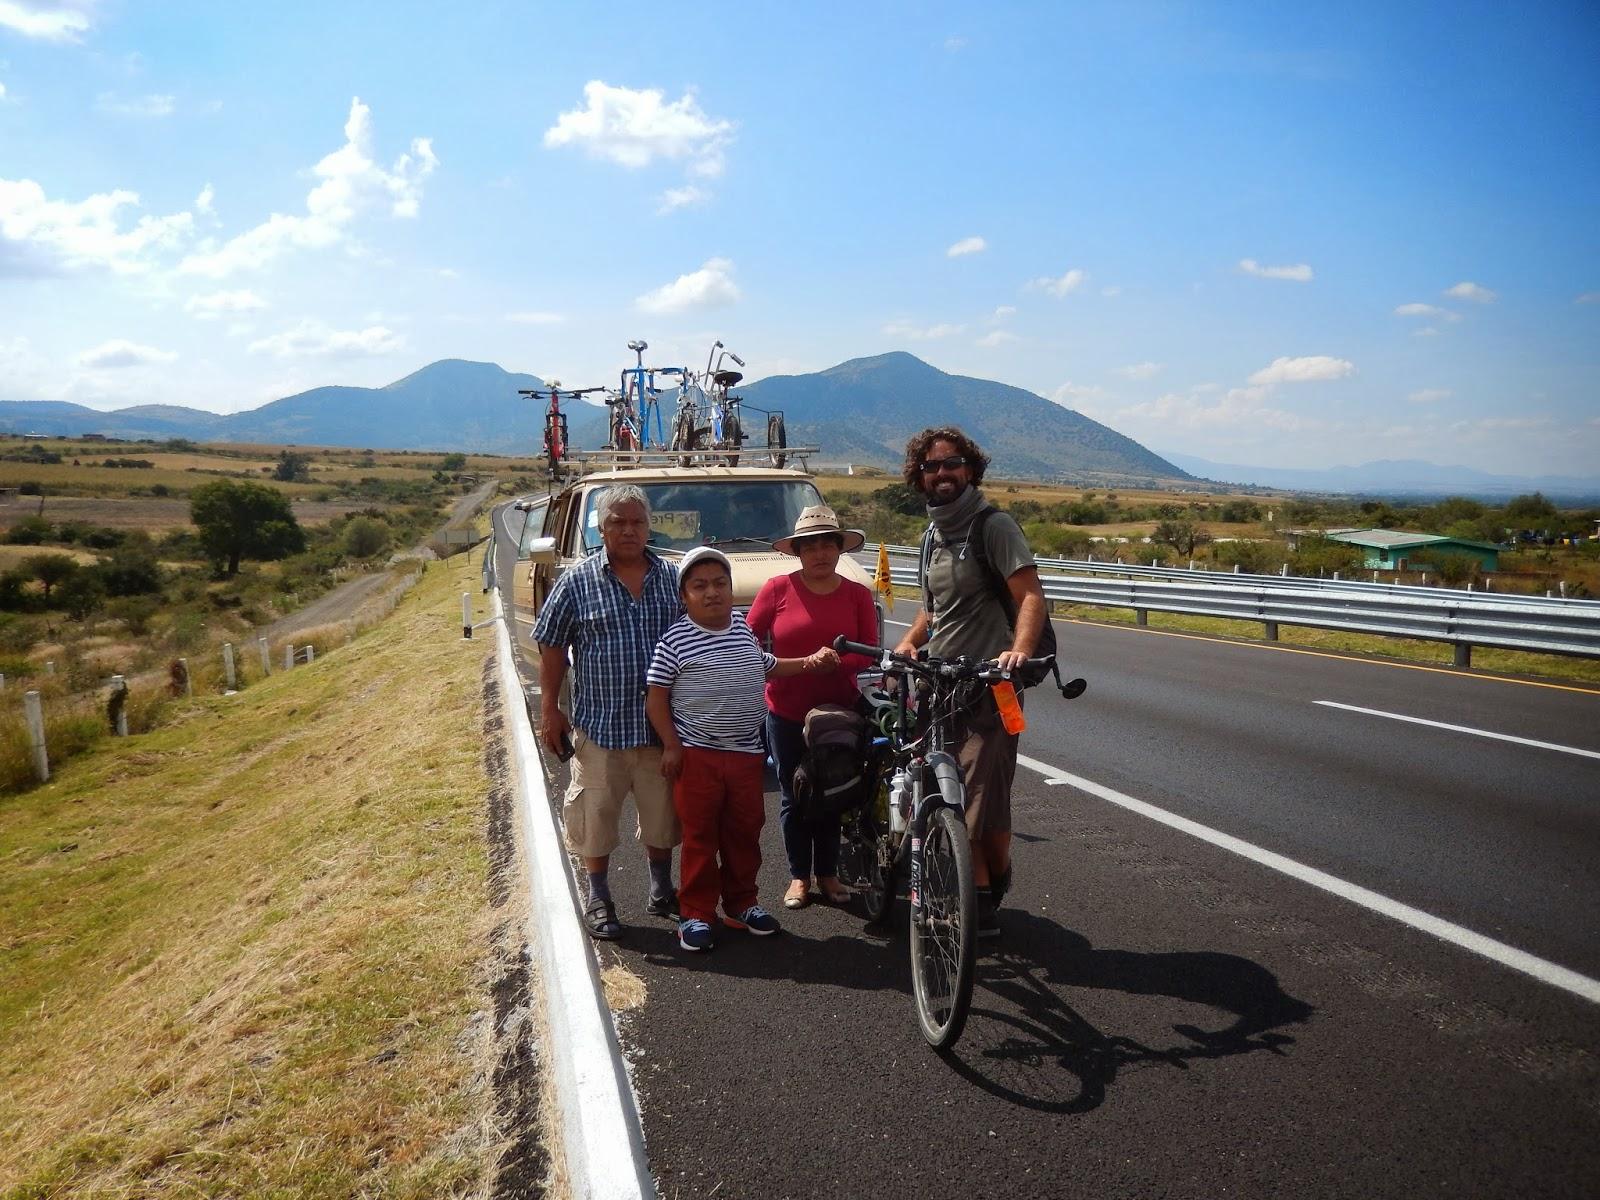 cicloturista, panamericana, bob yak, america en bicicleta